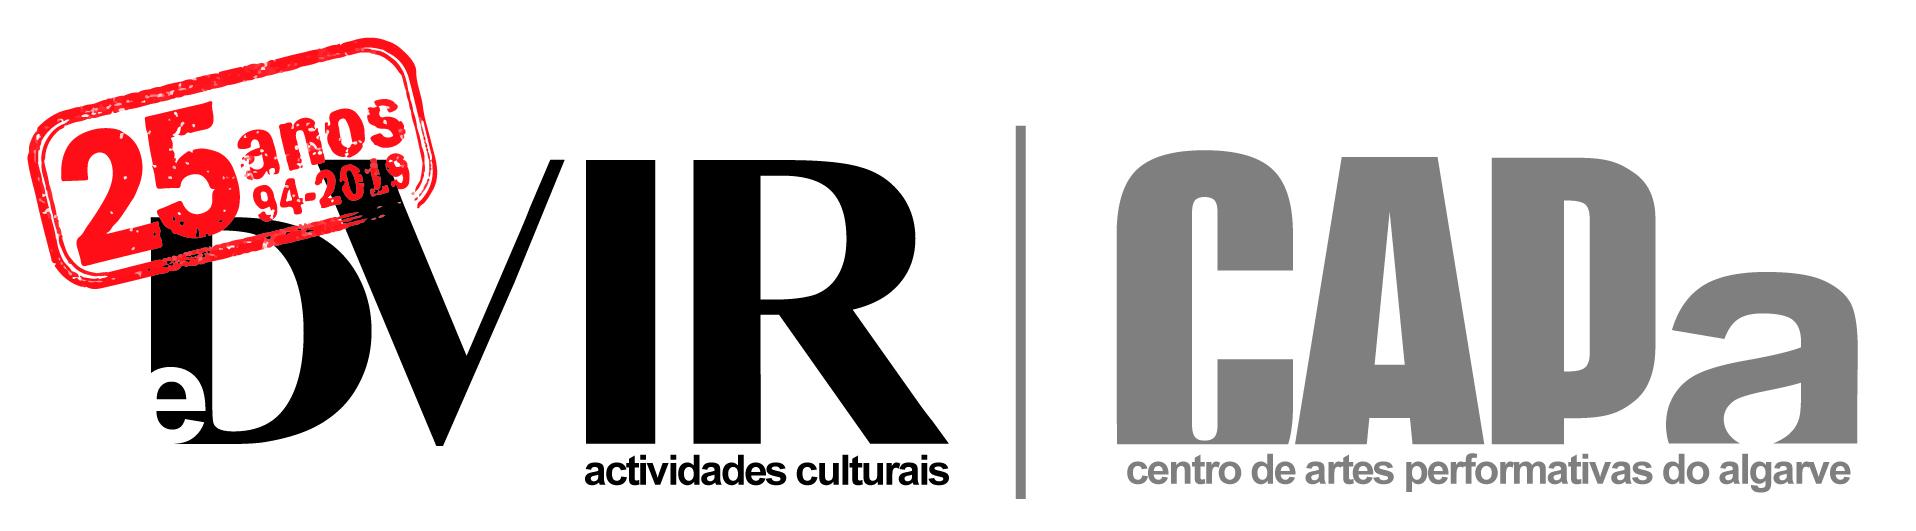 Logo_DEVIRCAPA_25anos